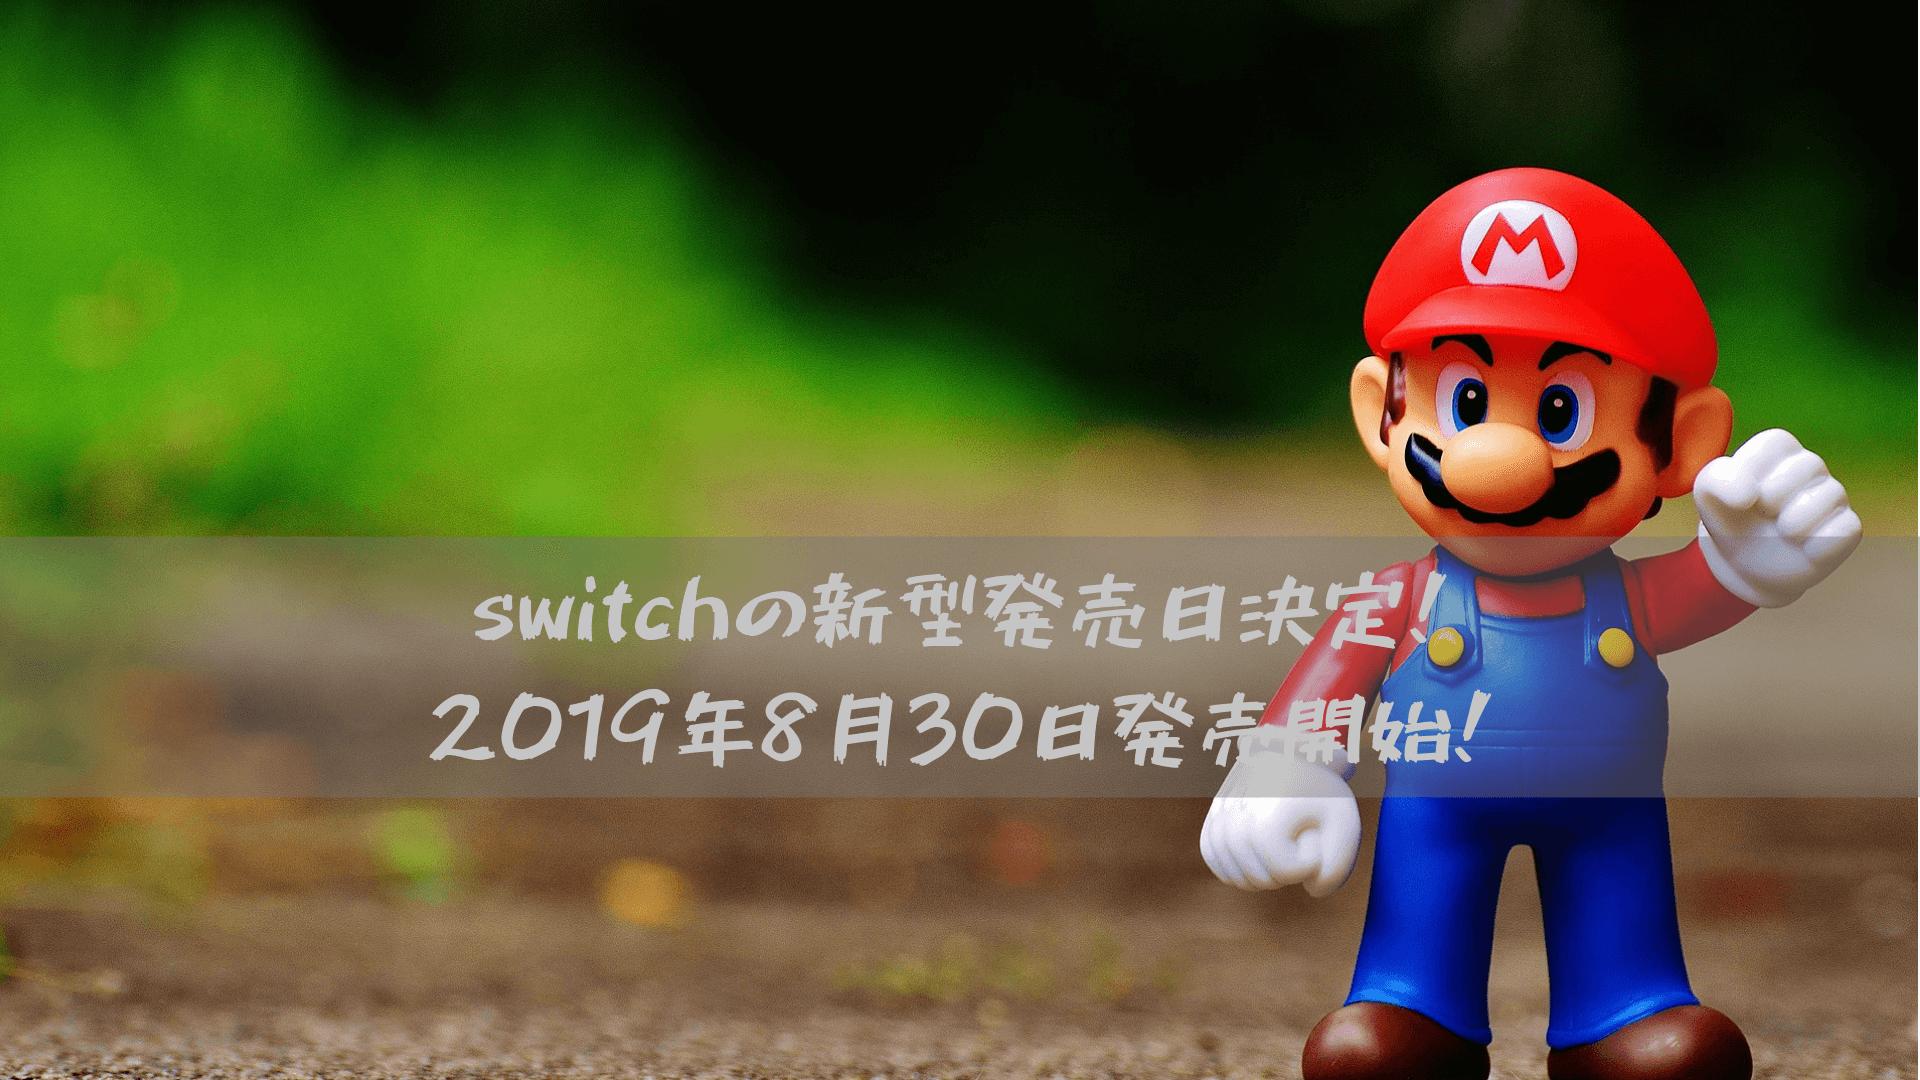 switchの新型発売日決定!2019年8月30日発売開始!